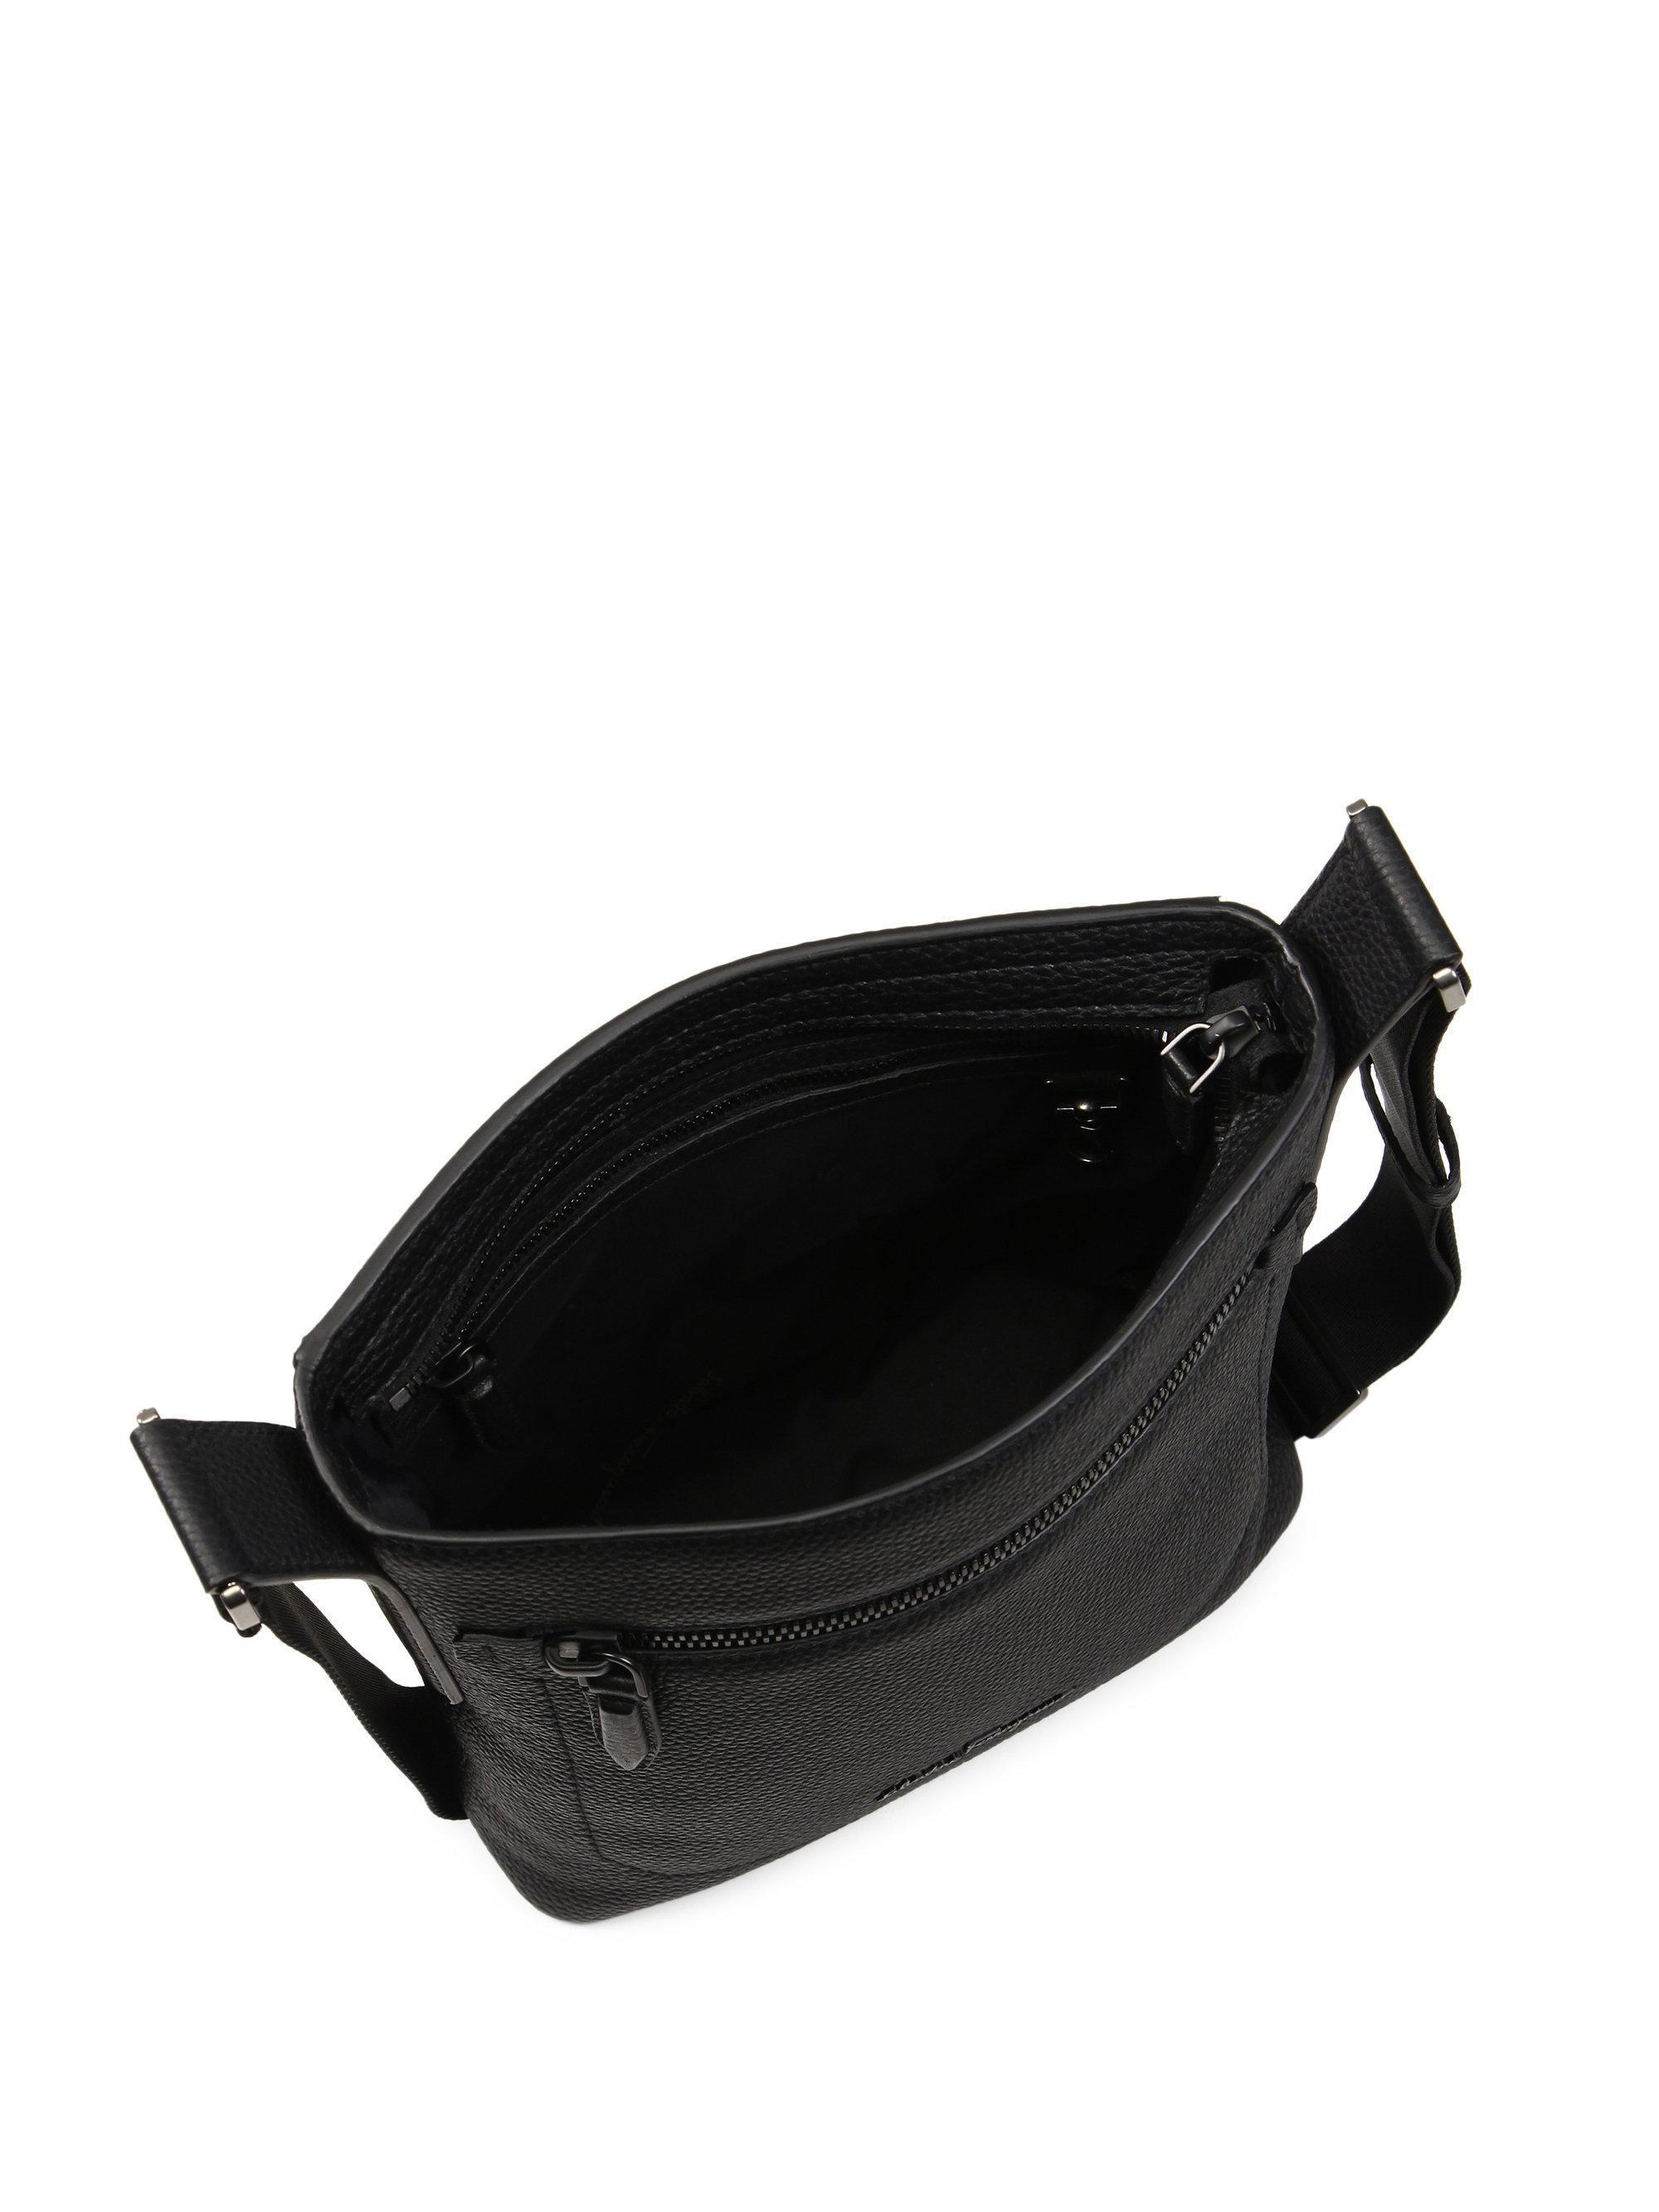 8c7b774c05 Lyst - Ferragamo Men s Muflone Leather Crossbody Bag - Black in ...